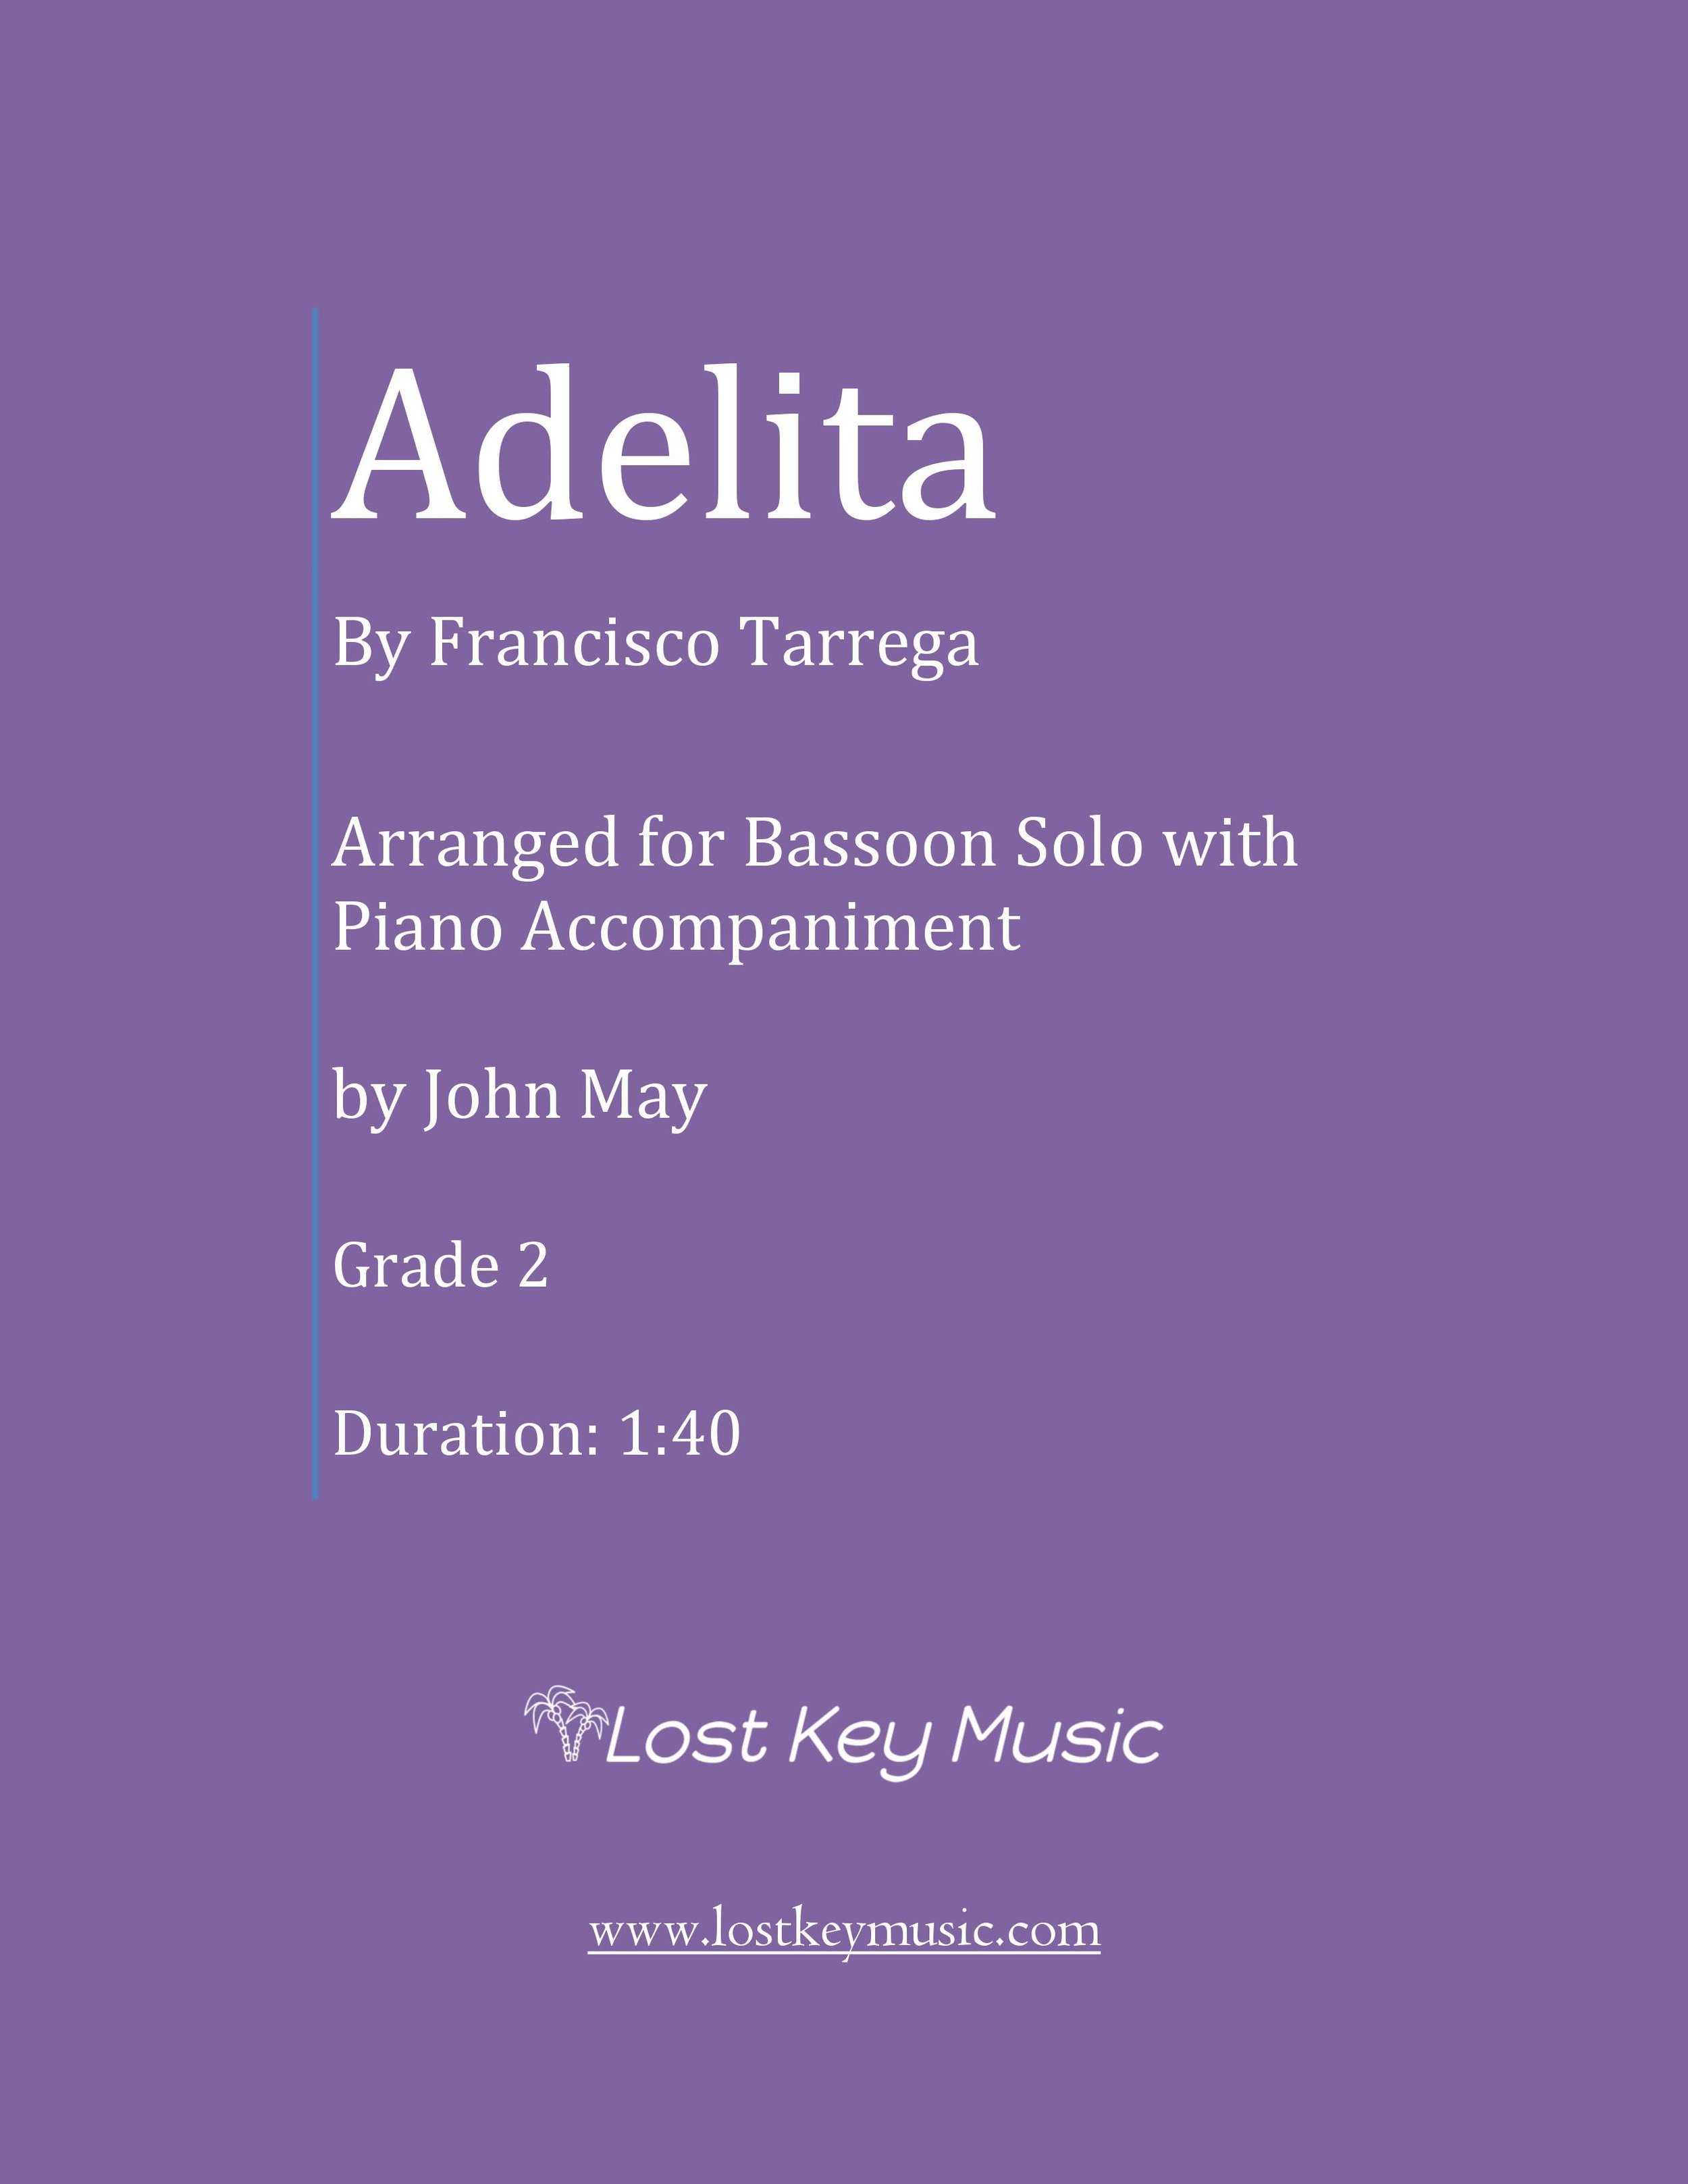 Adelita-Bassoon Solo-Cover Photo.jpg